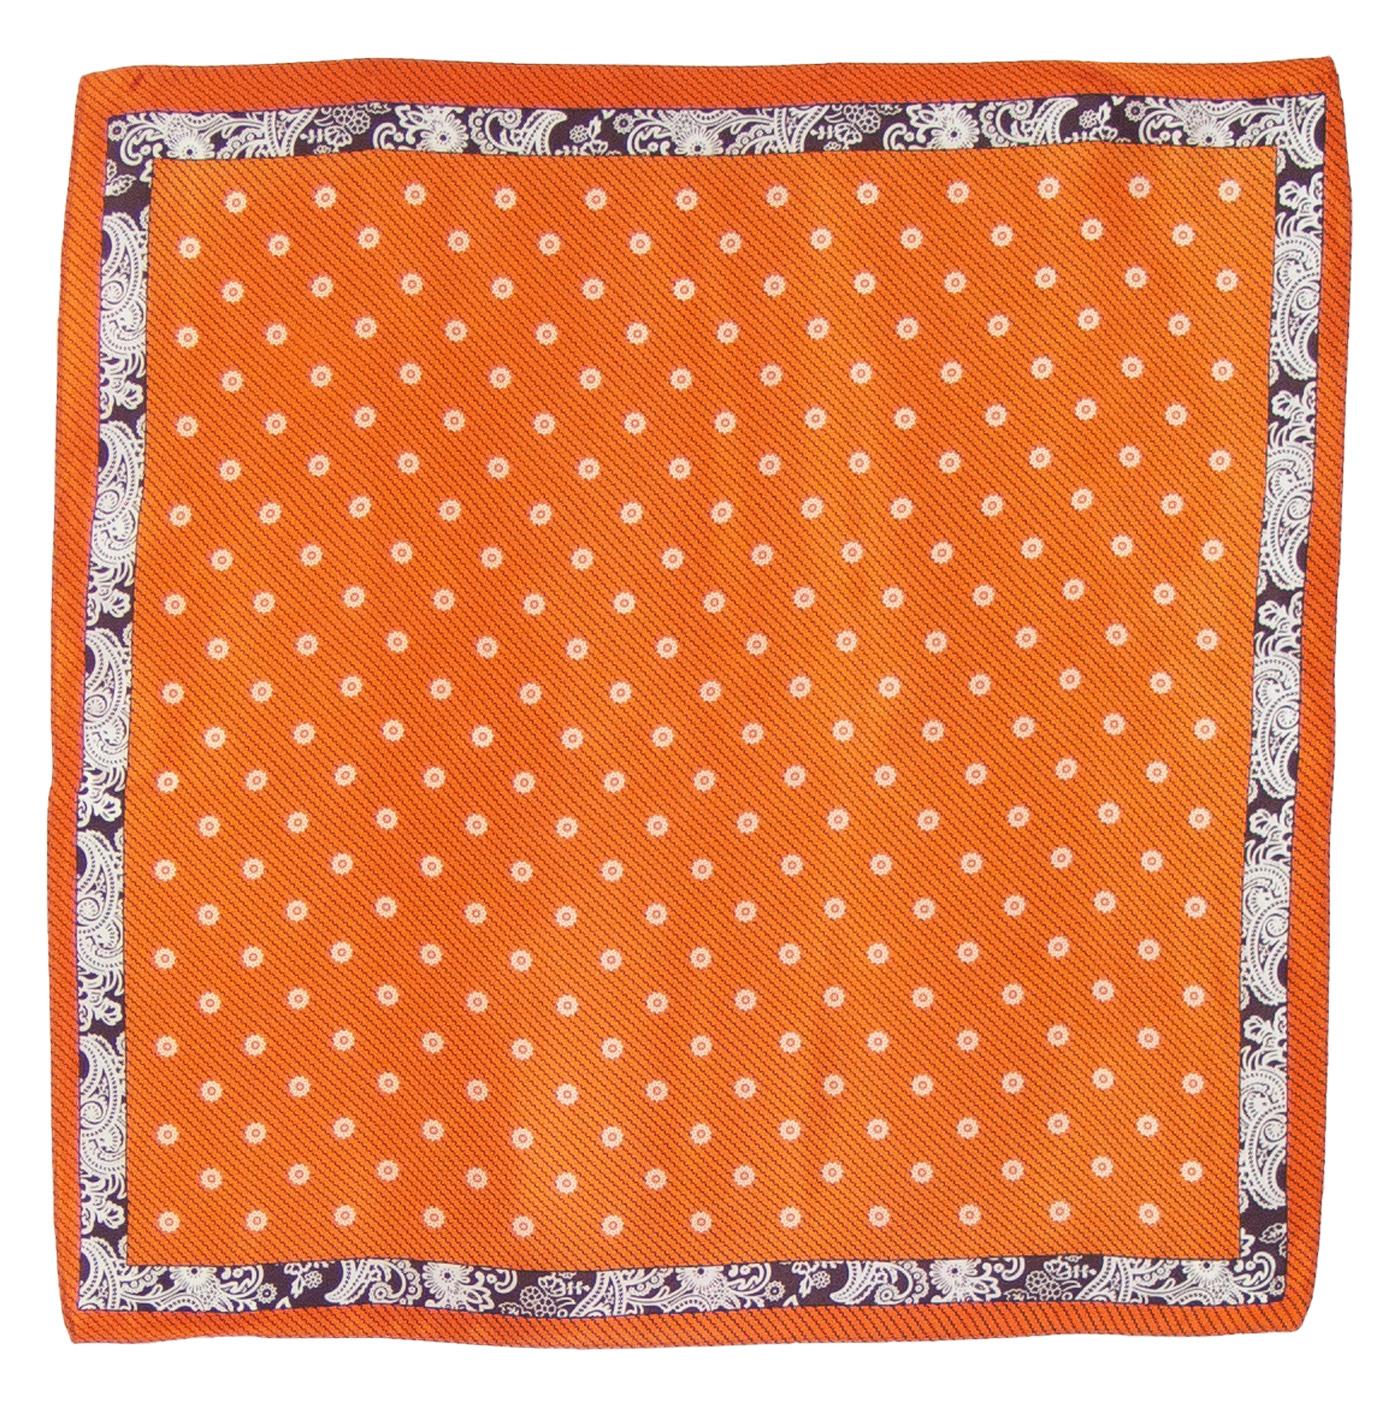 Foulard en soie carré orange Loriane 50 cm